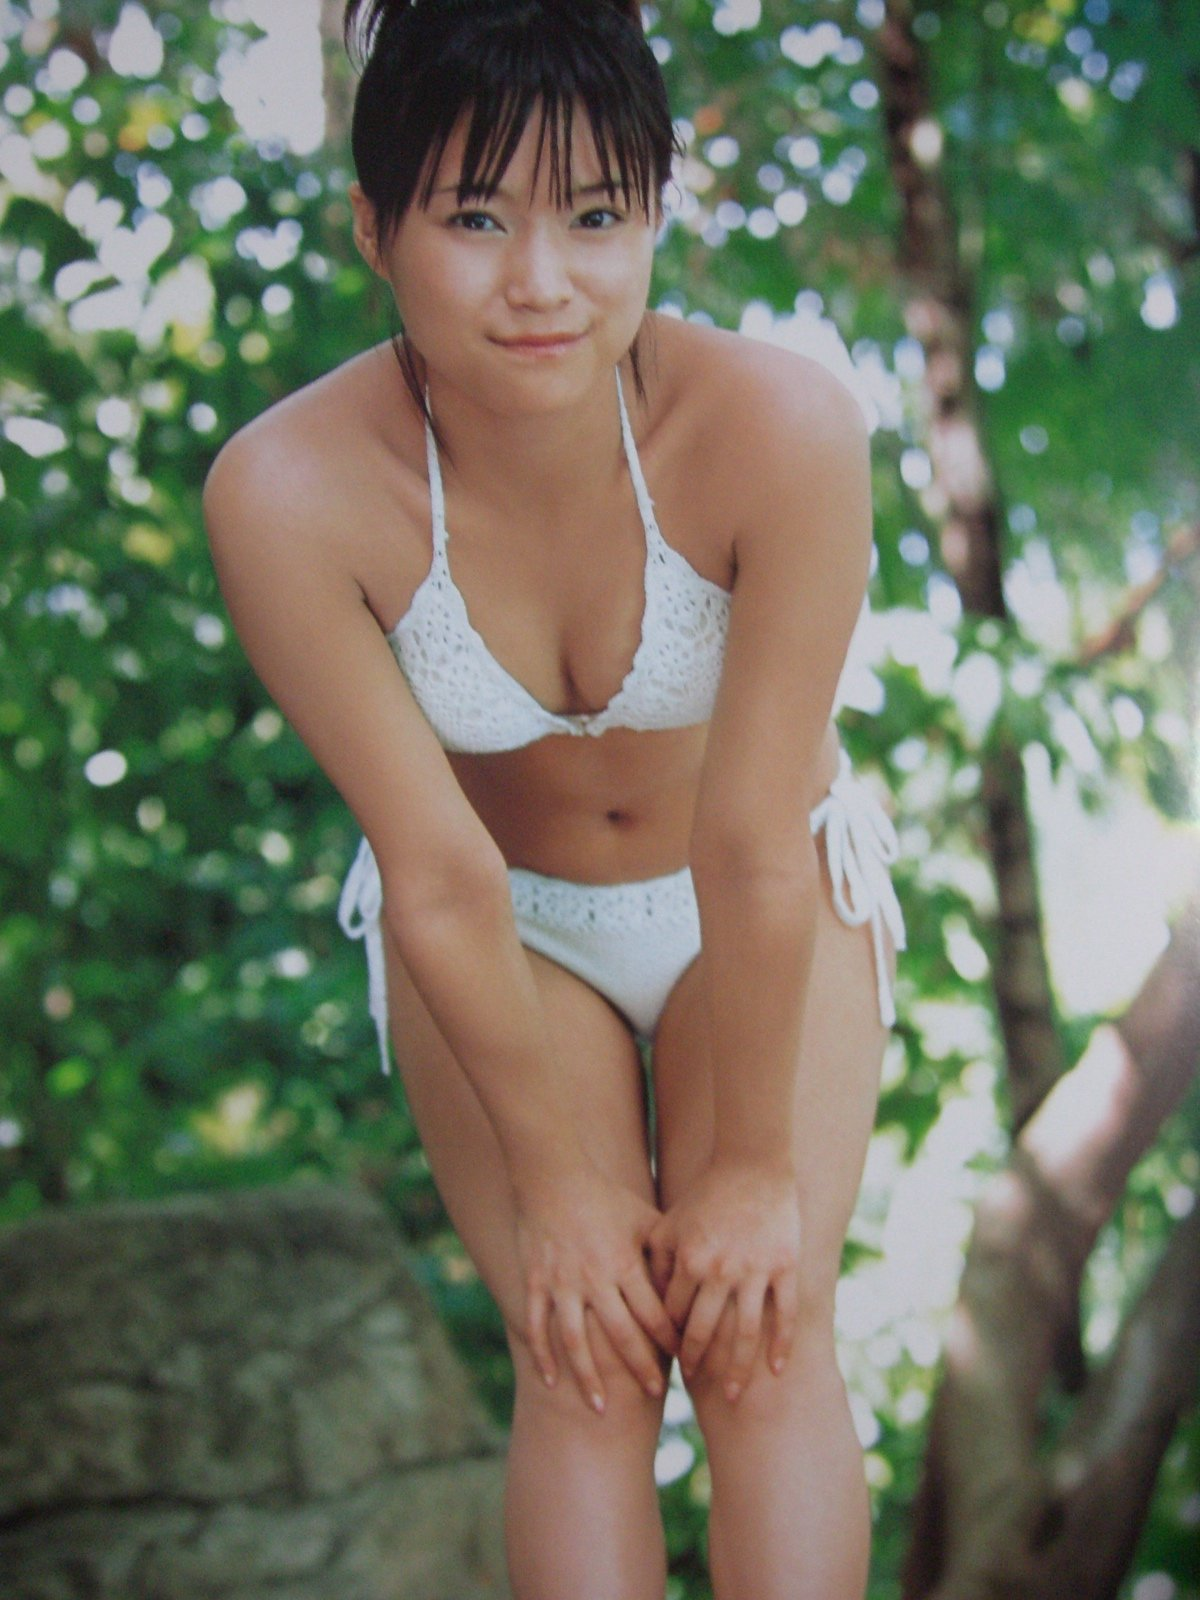 Eri Kamei-Japanese Idol Singer And Member of MorningMusume